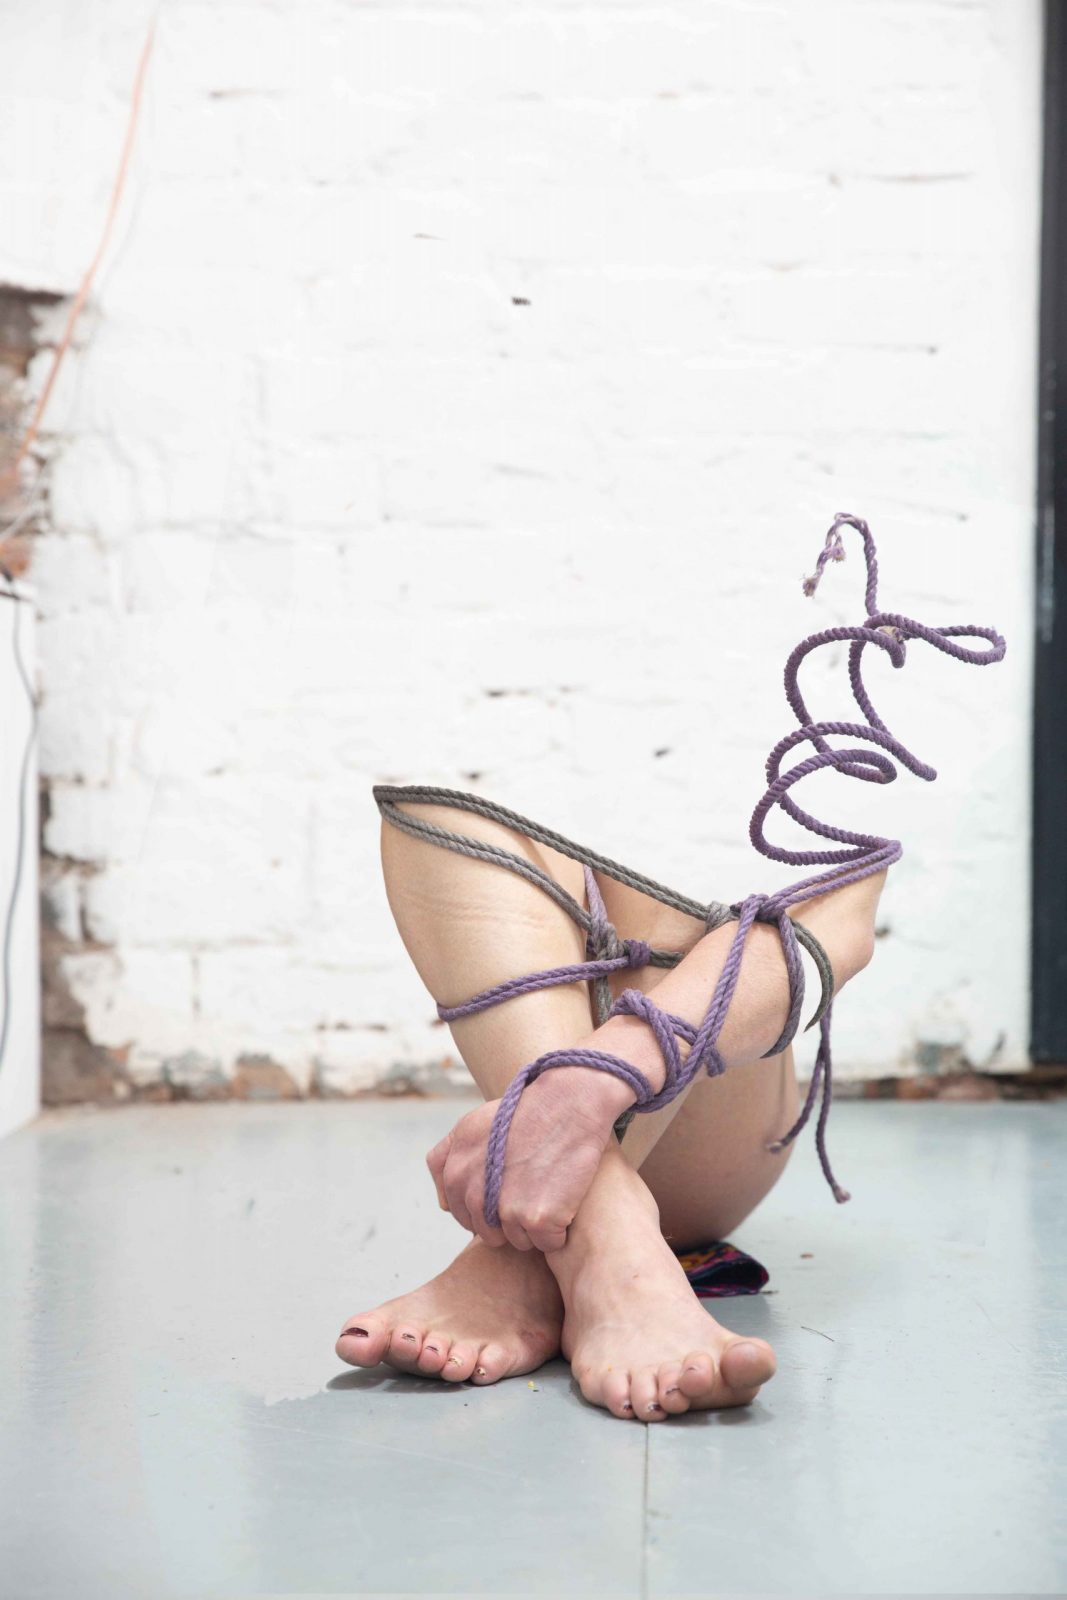 Woman's legs tangled in rope - Unseen by Suzie Larke